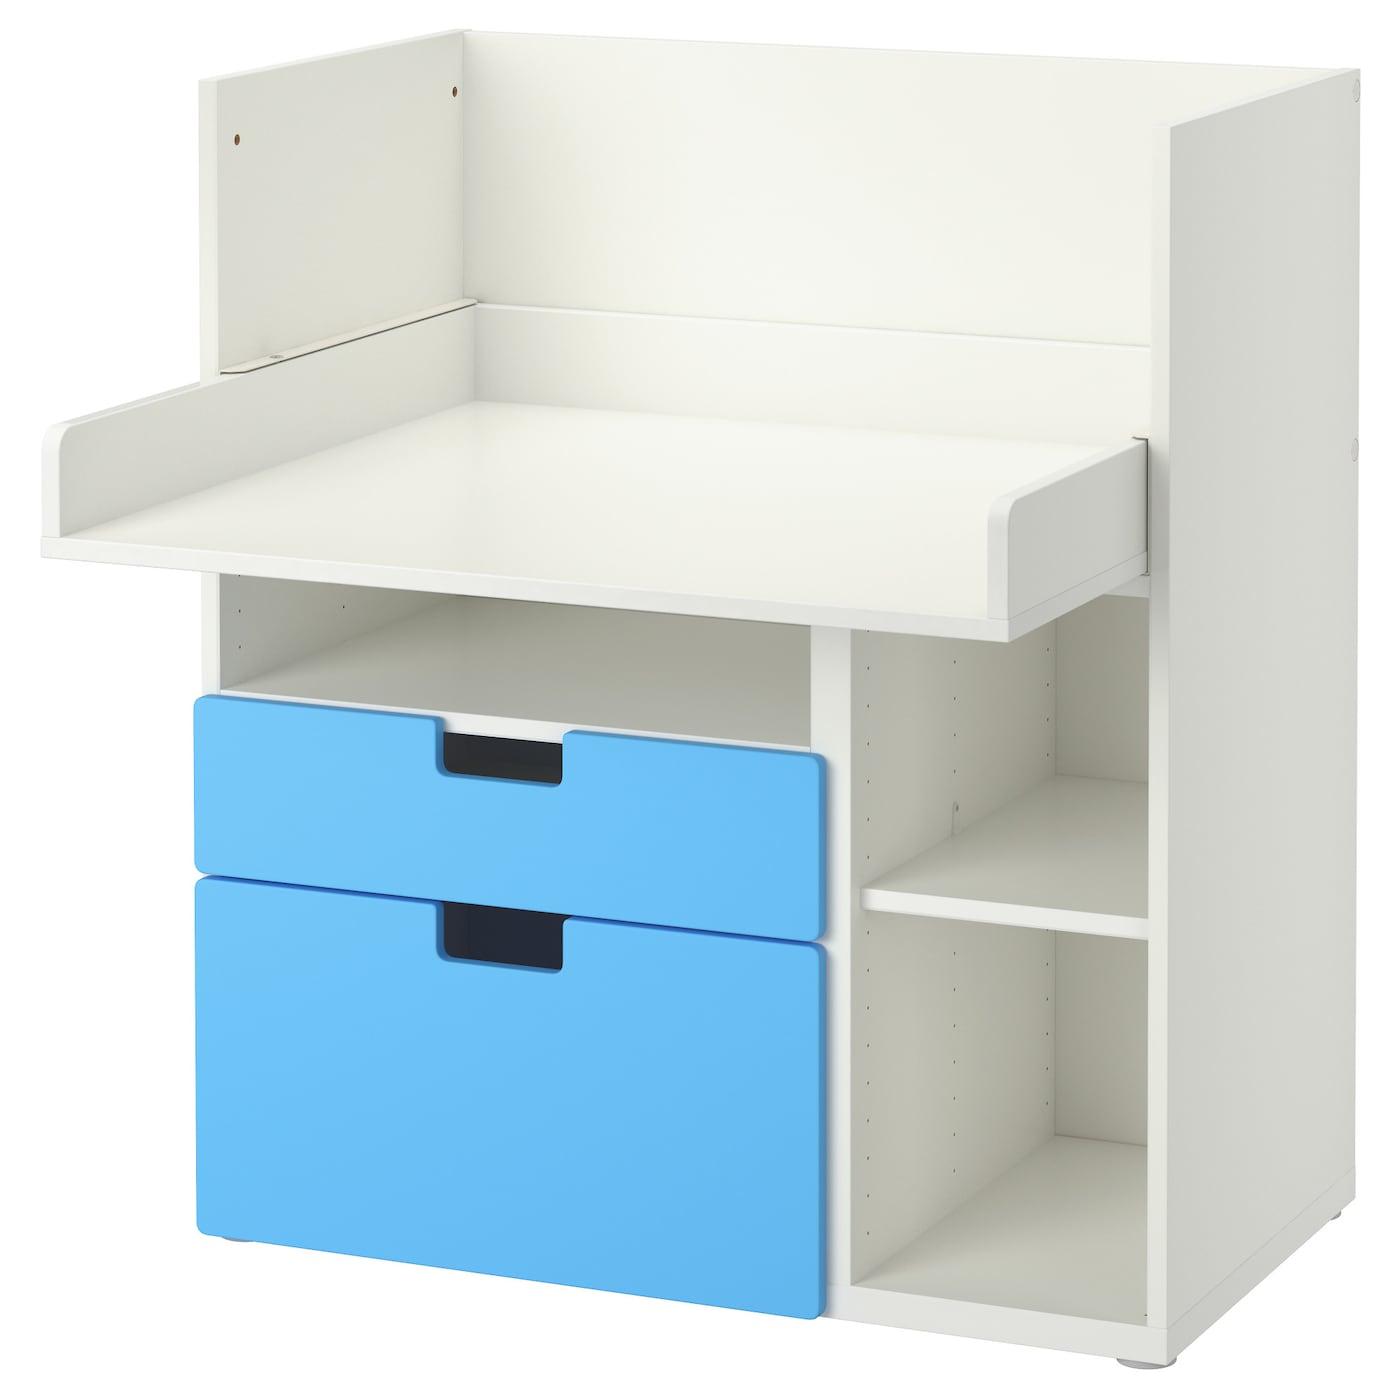 stuva desk with 2 drawers white blue 90x79x102 cm ikea. Black Bedroom Furniture Sets. Home Design Ideas